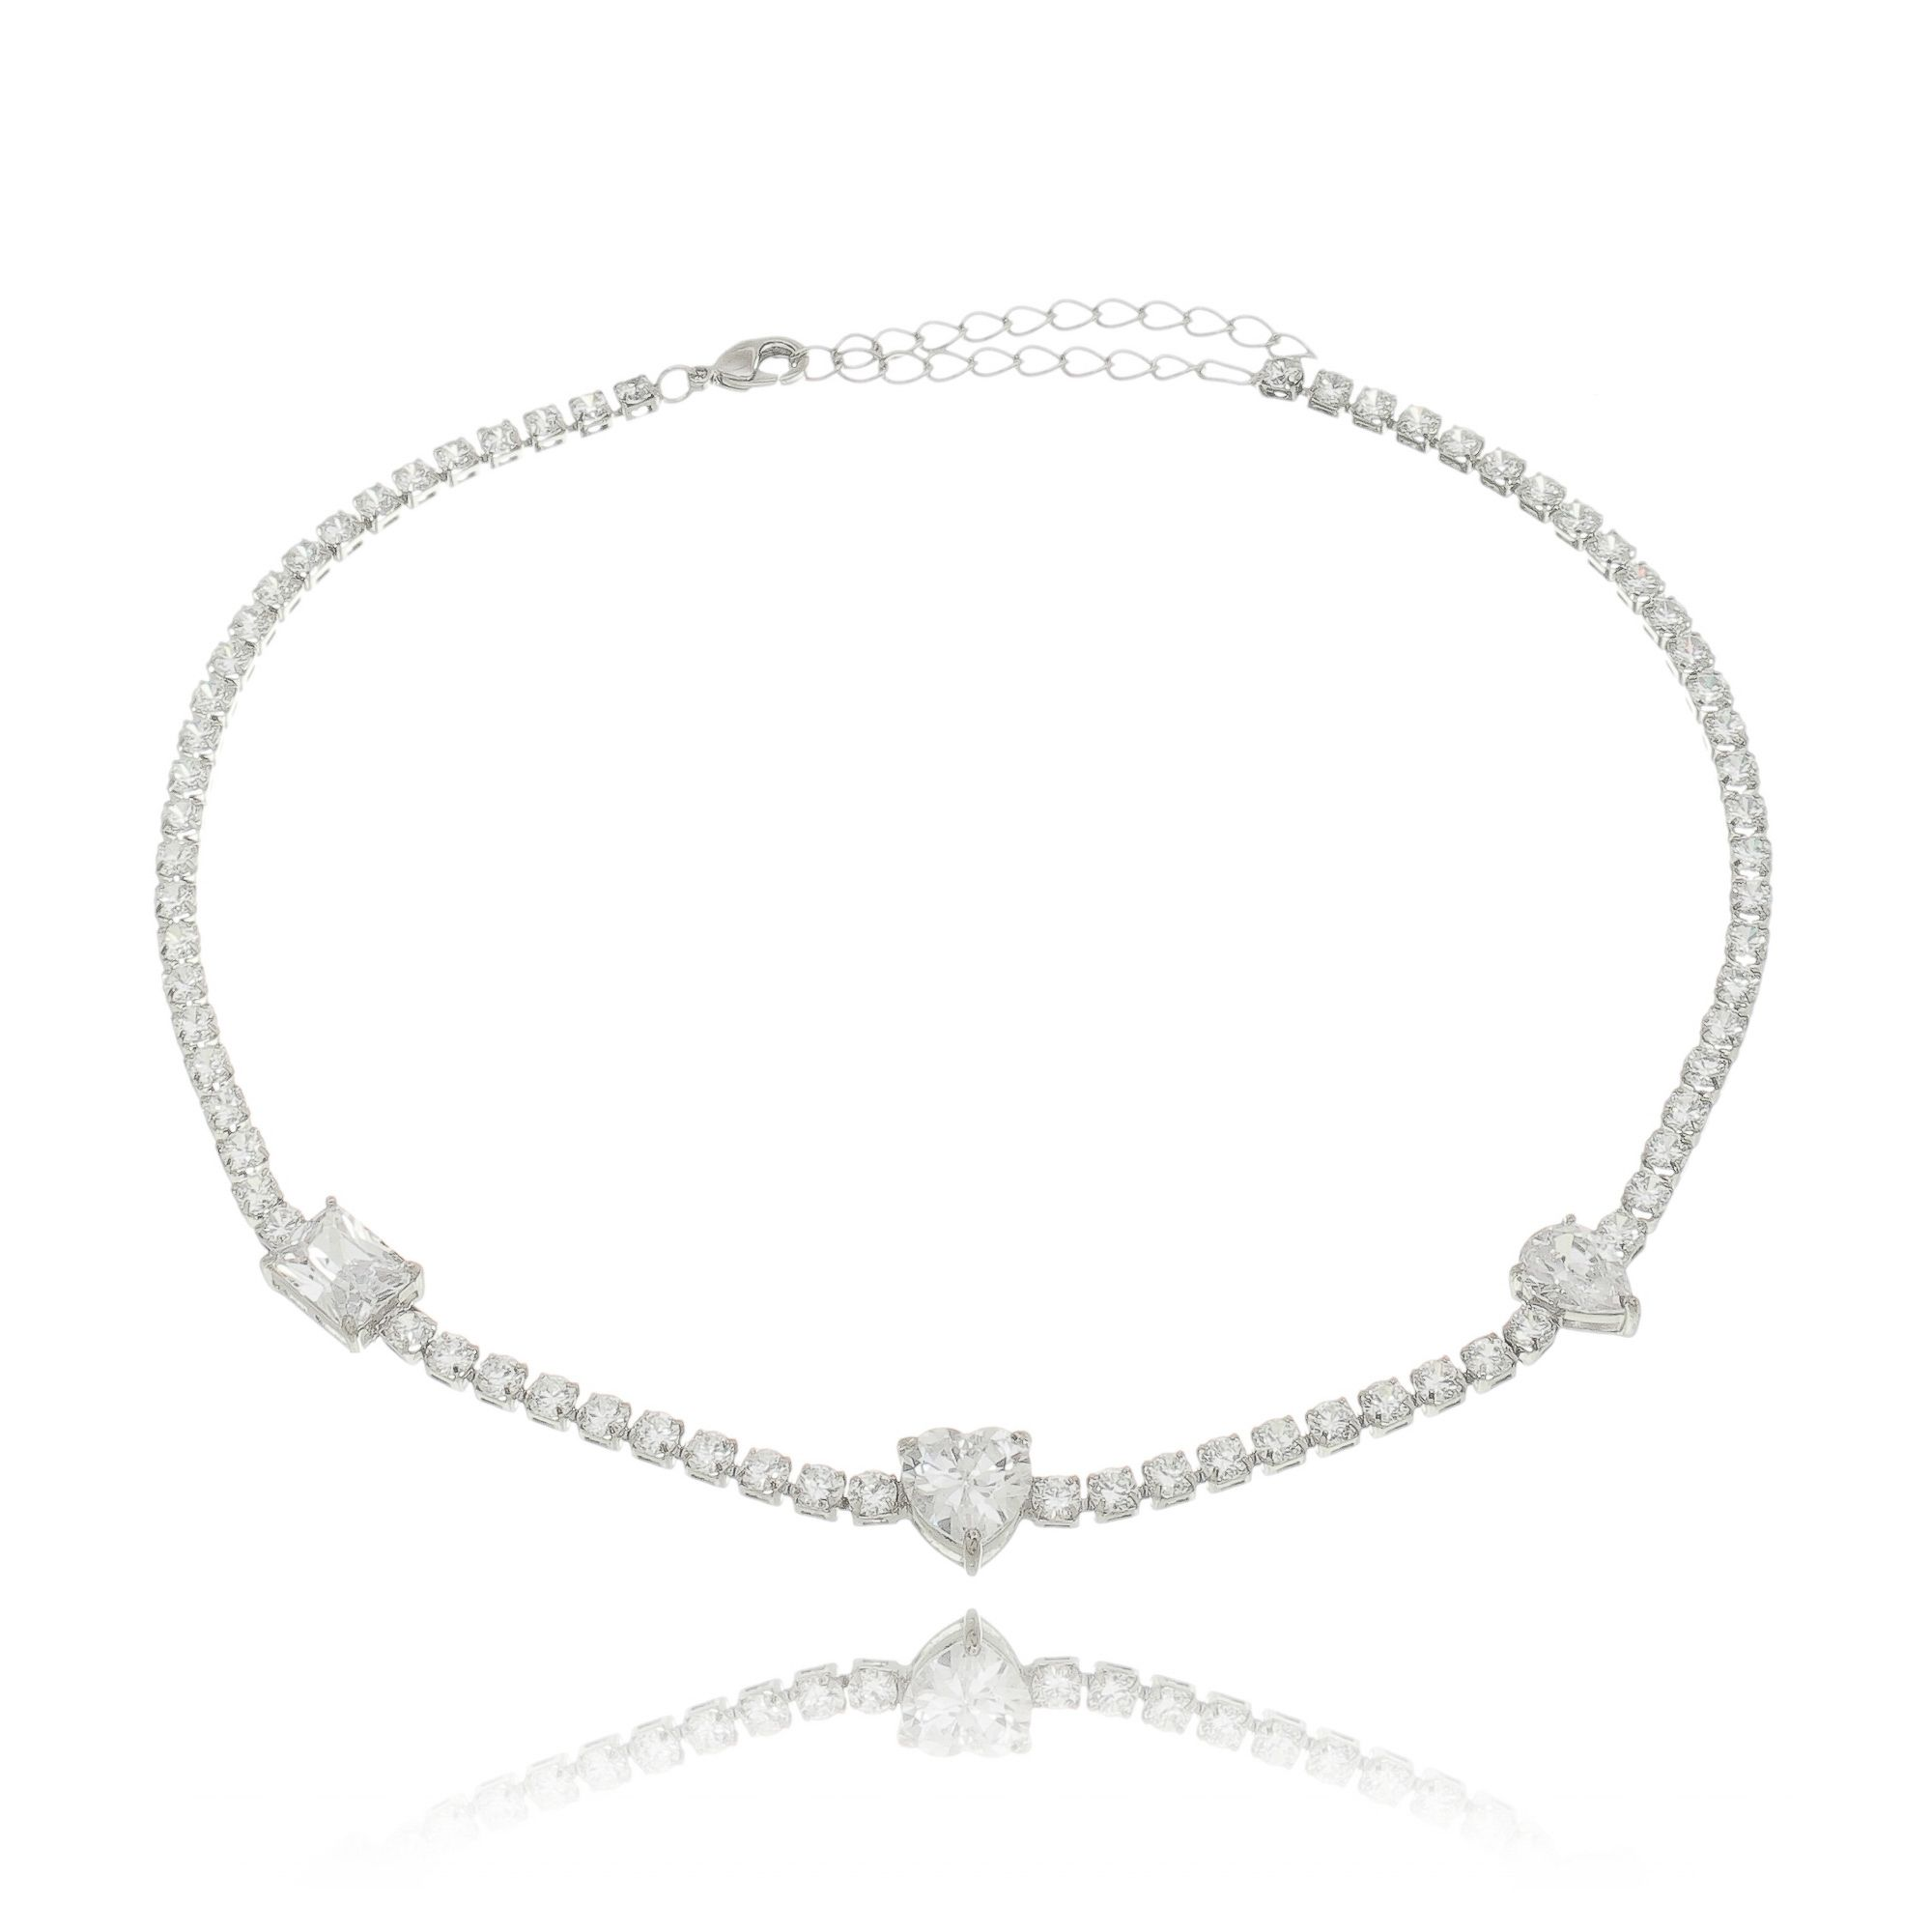 Choker Zircônia Cristal Riviera com Pingentes Semijoia Fina em Ródio Branco  - Soloyou